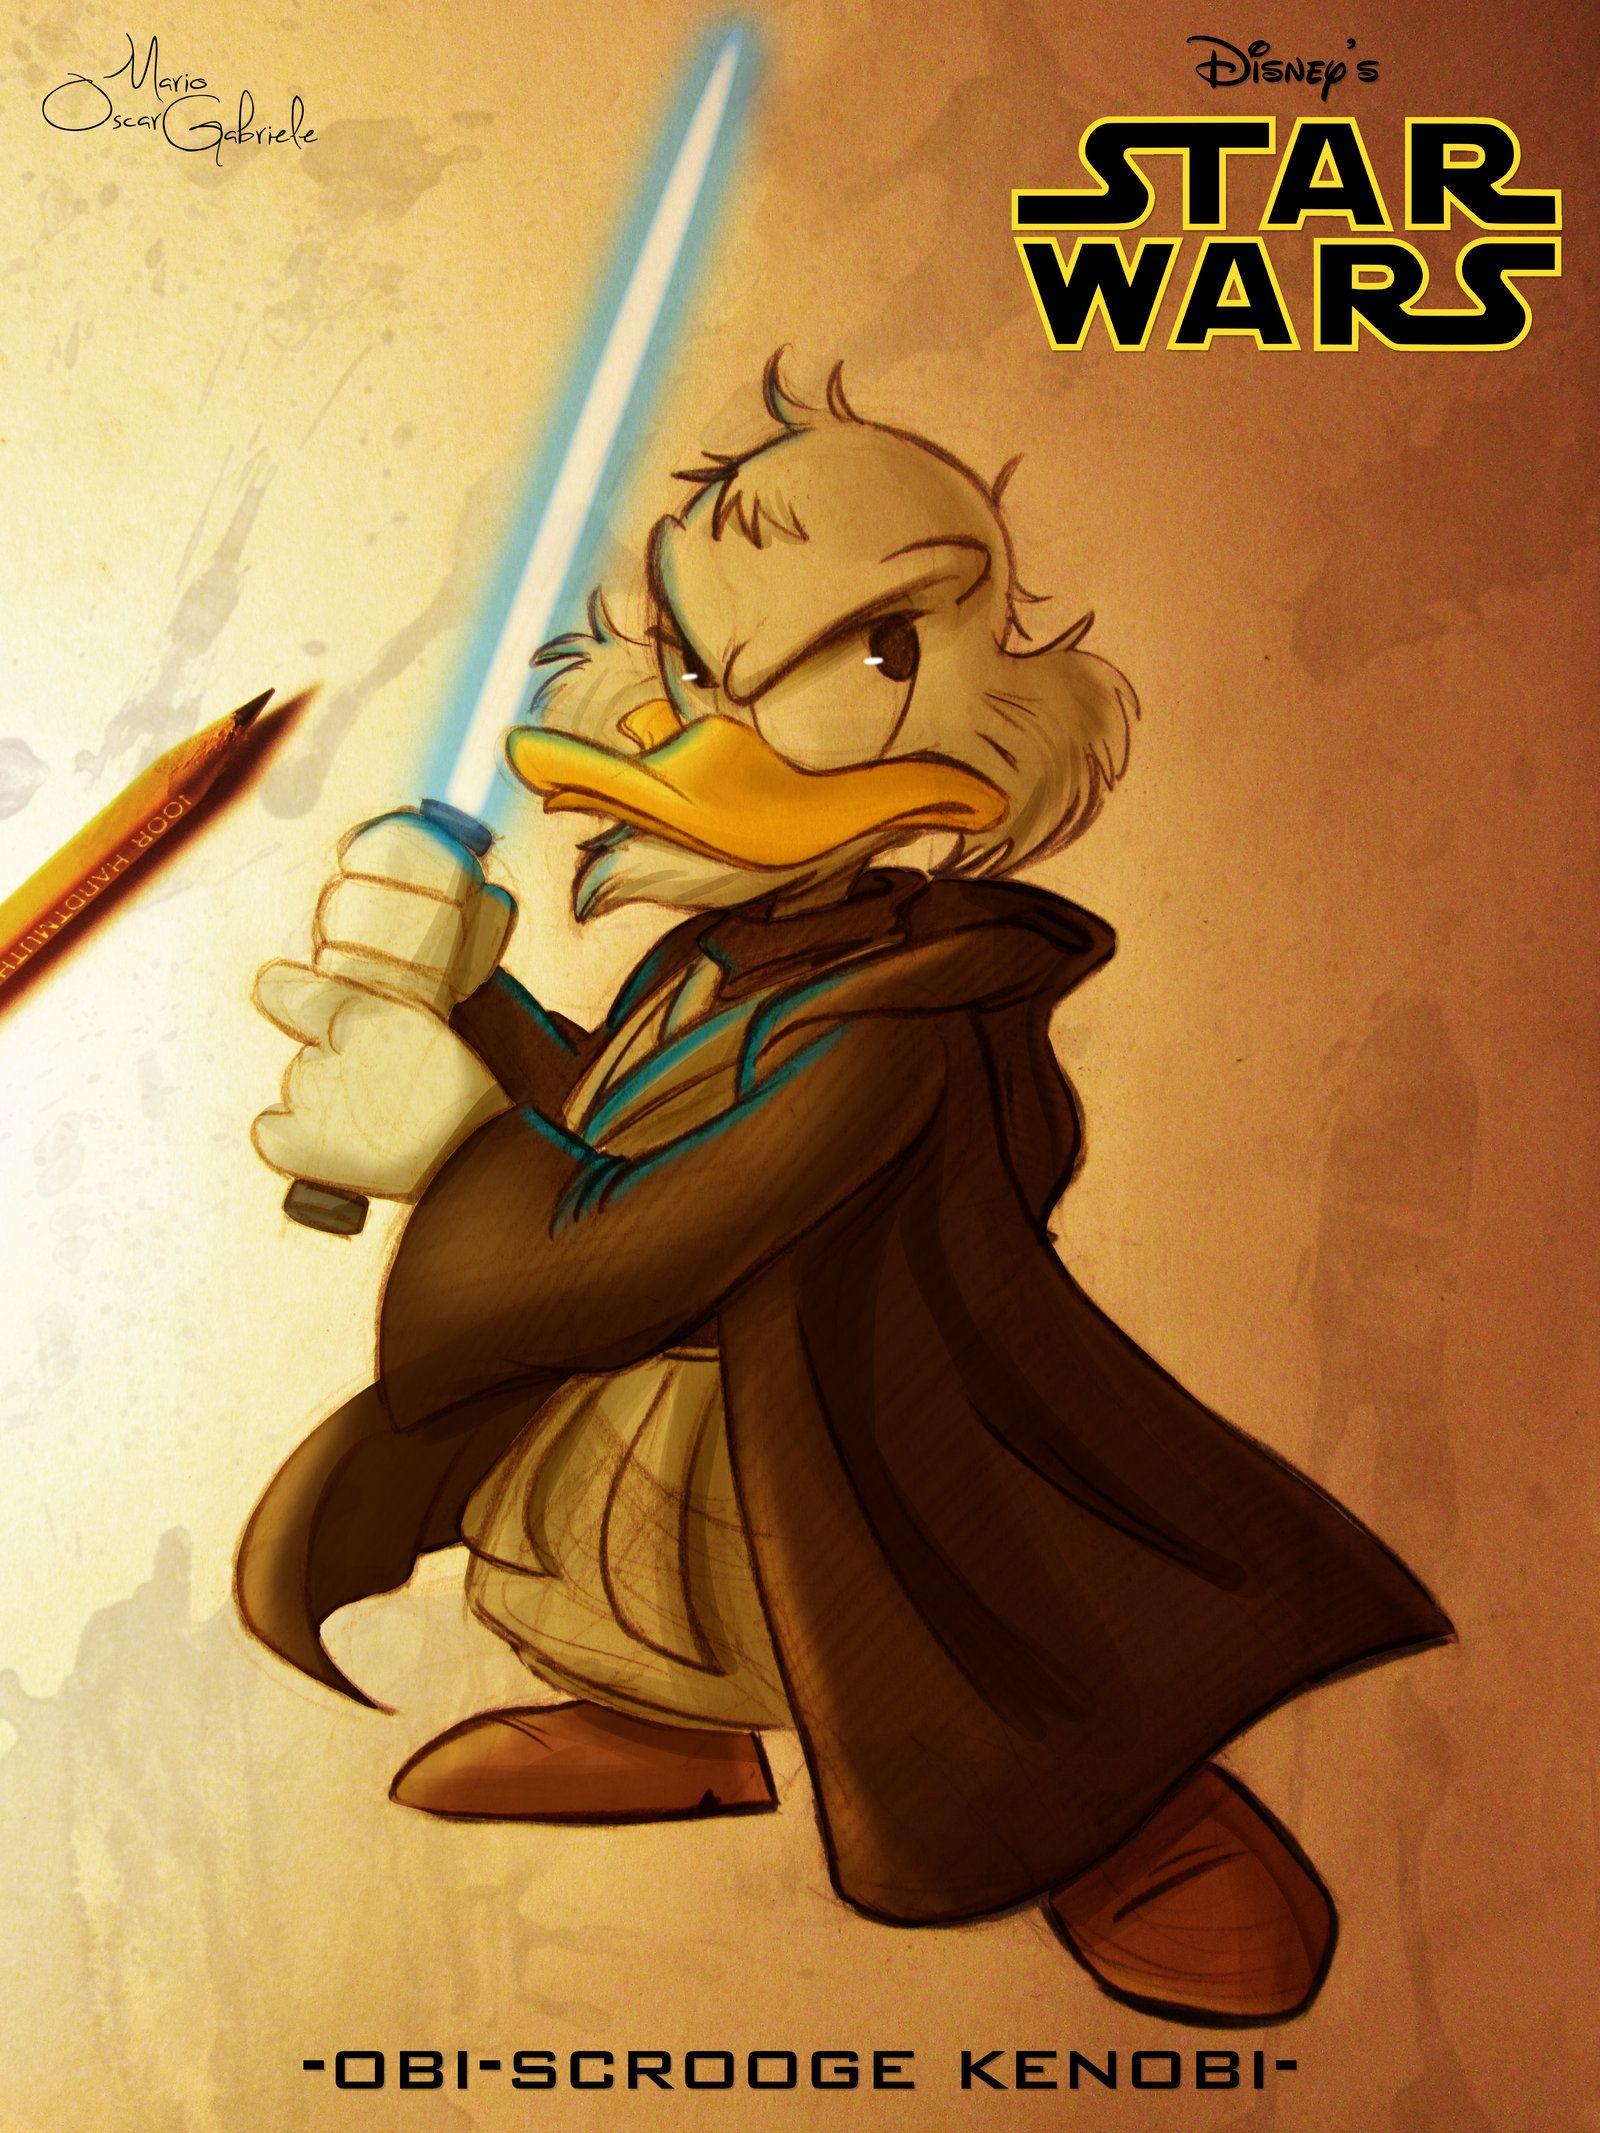 Obi Scrooge Kenobi by MarioOscarGabriele.deviantart.com on @DeviantArt